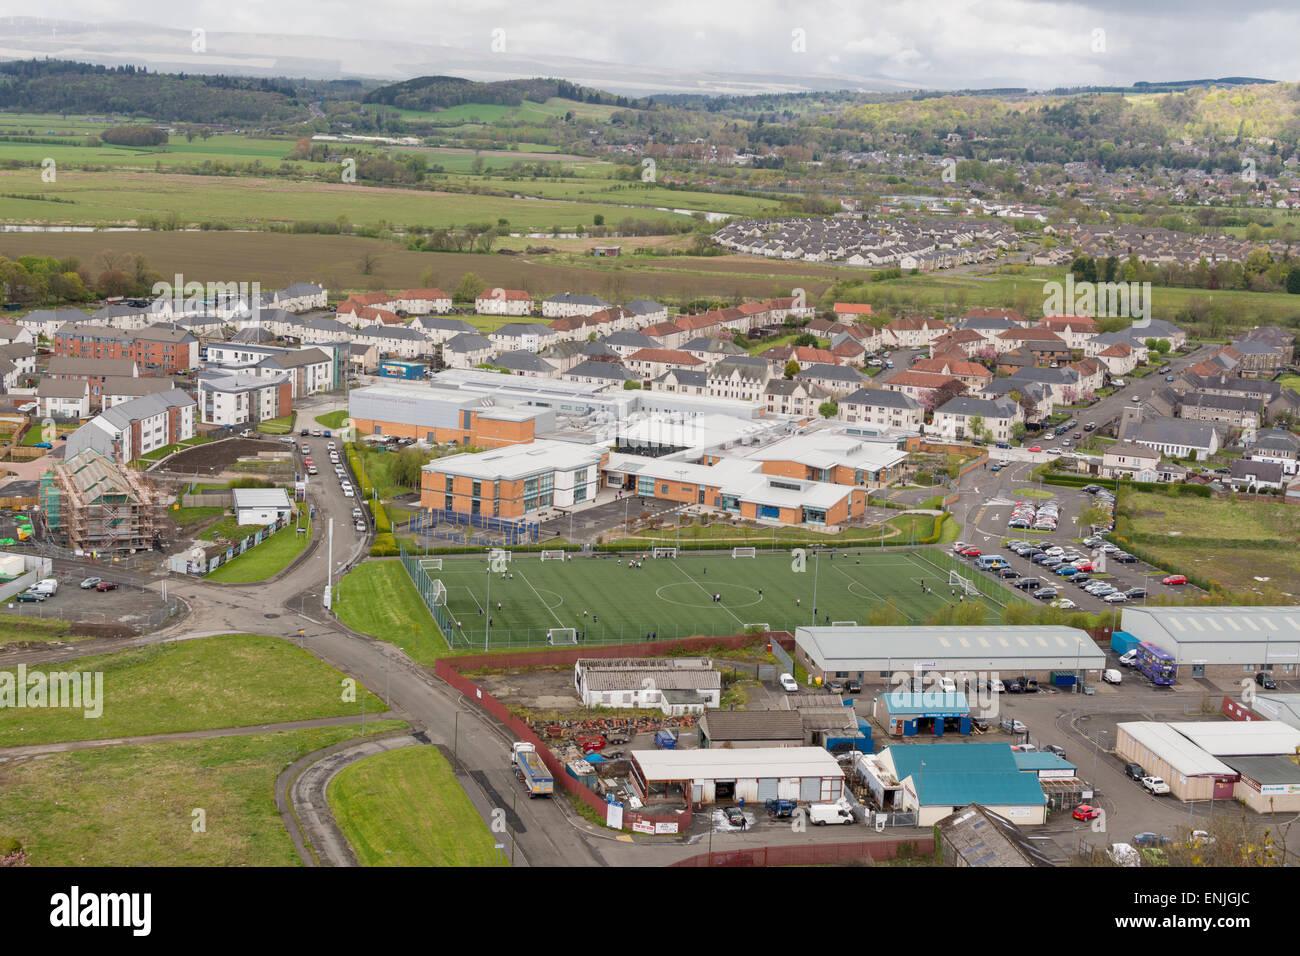 Urban regeneration, Scotland - Raploch Community Campus and housing developments - Stock Image